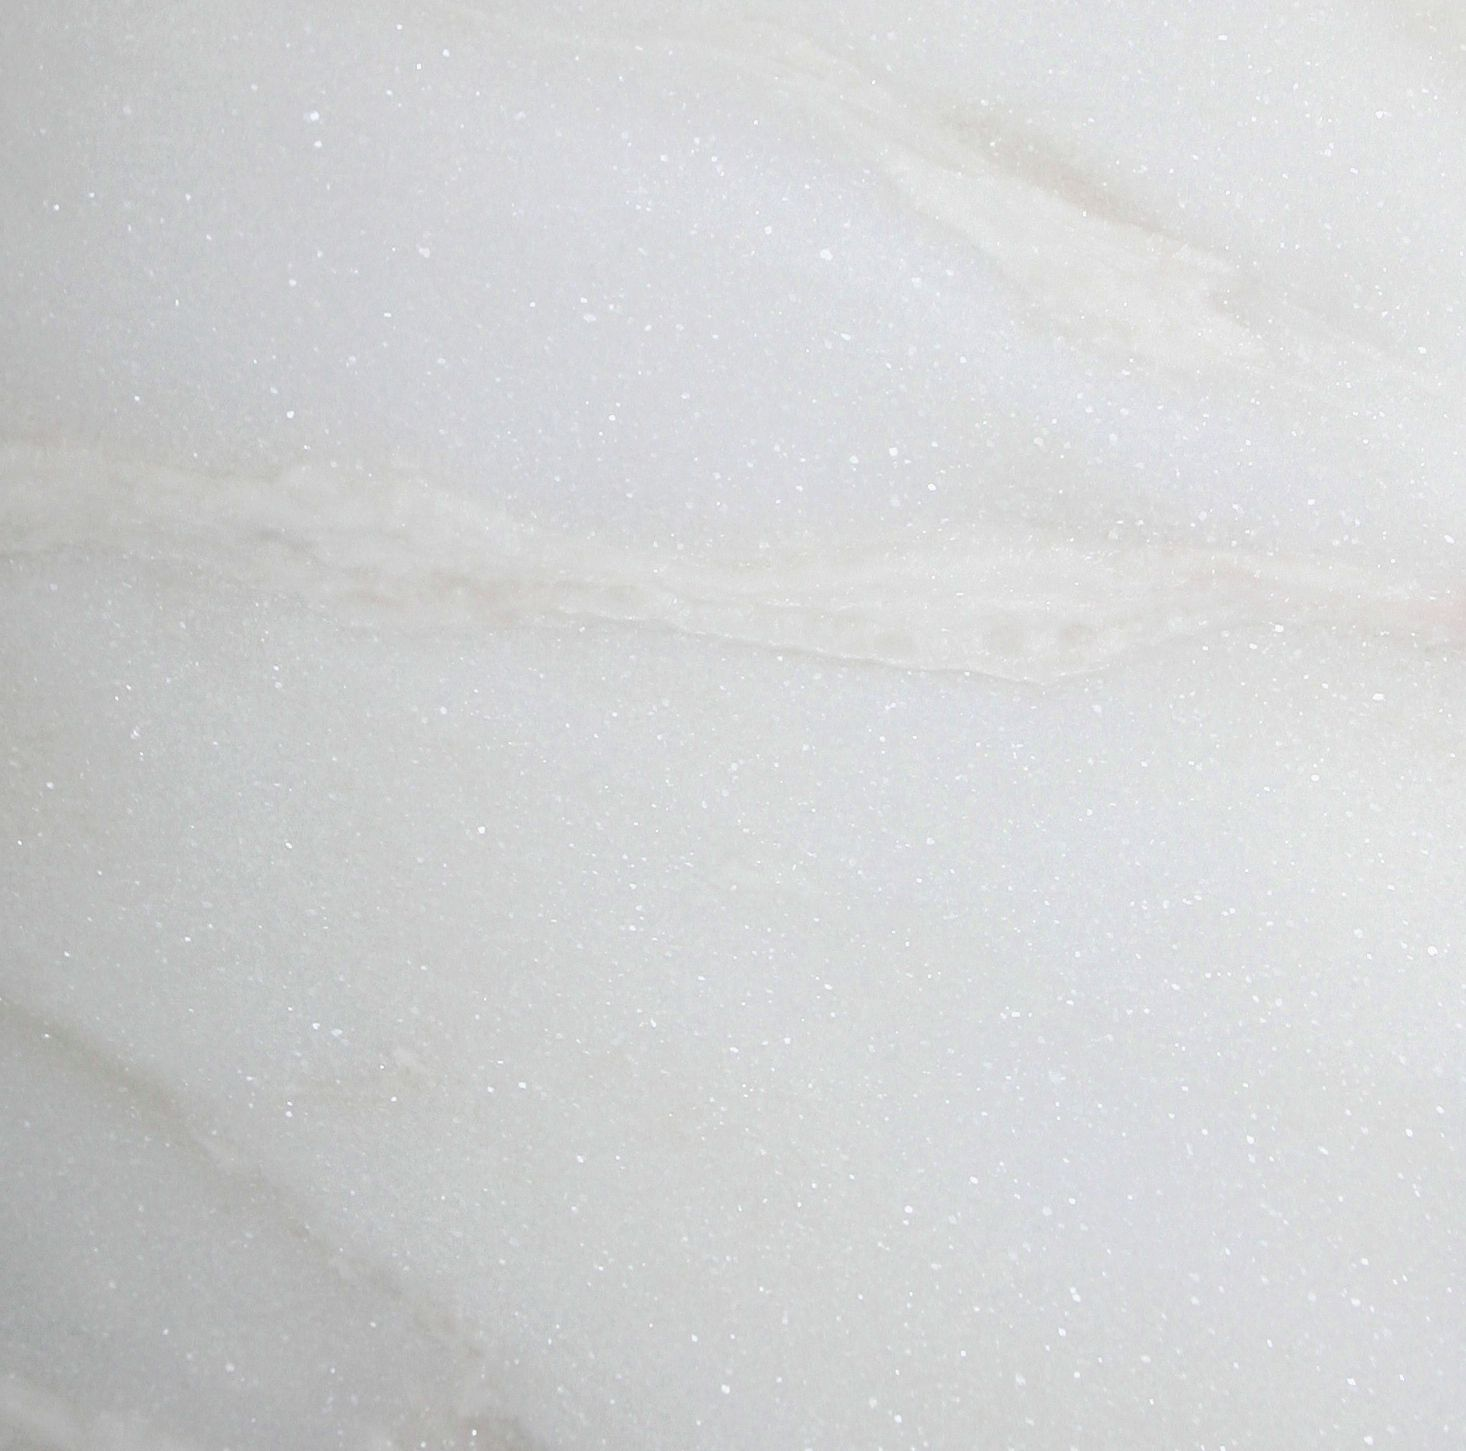 Master Bath And Powder Room Sugary Ice Cream Looking